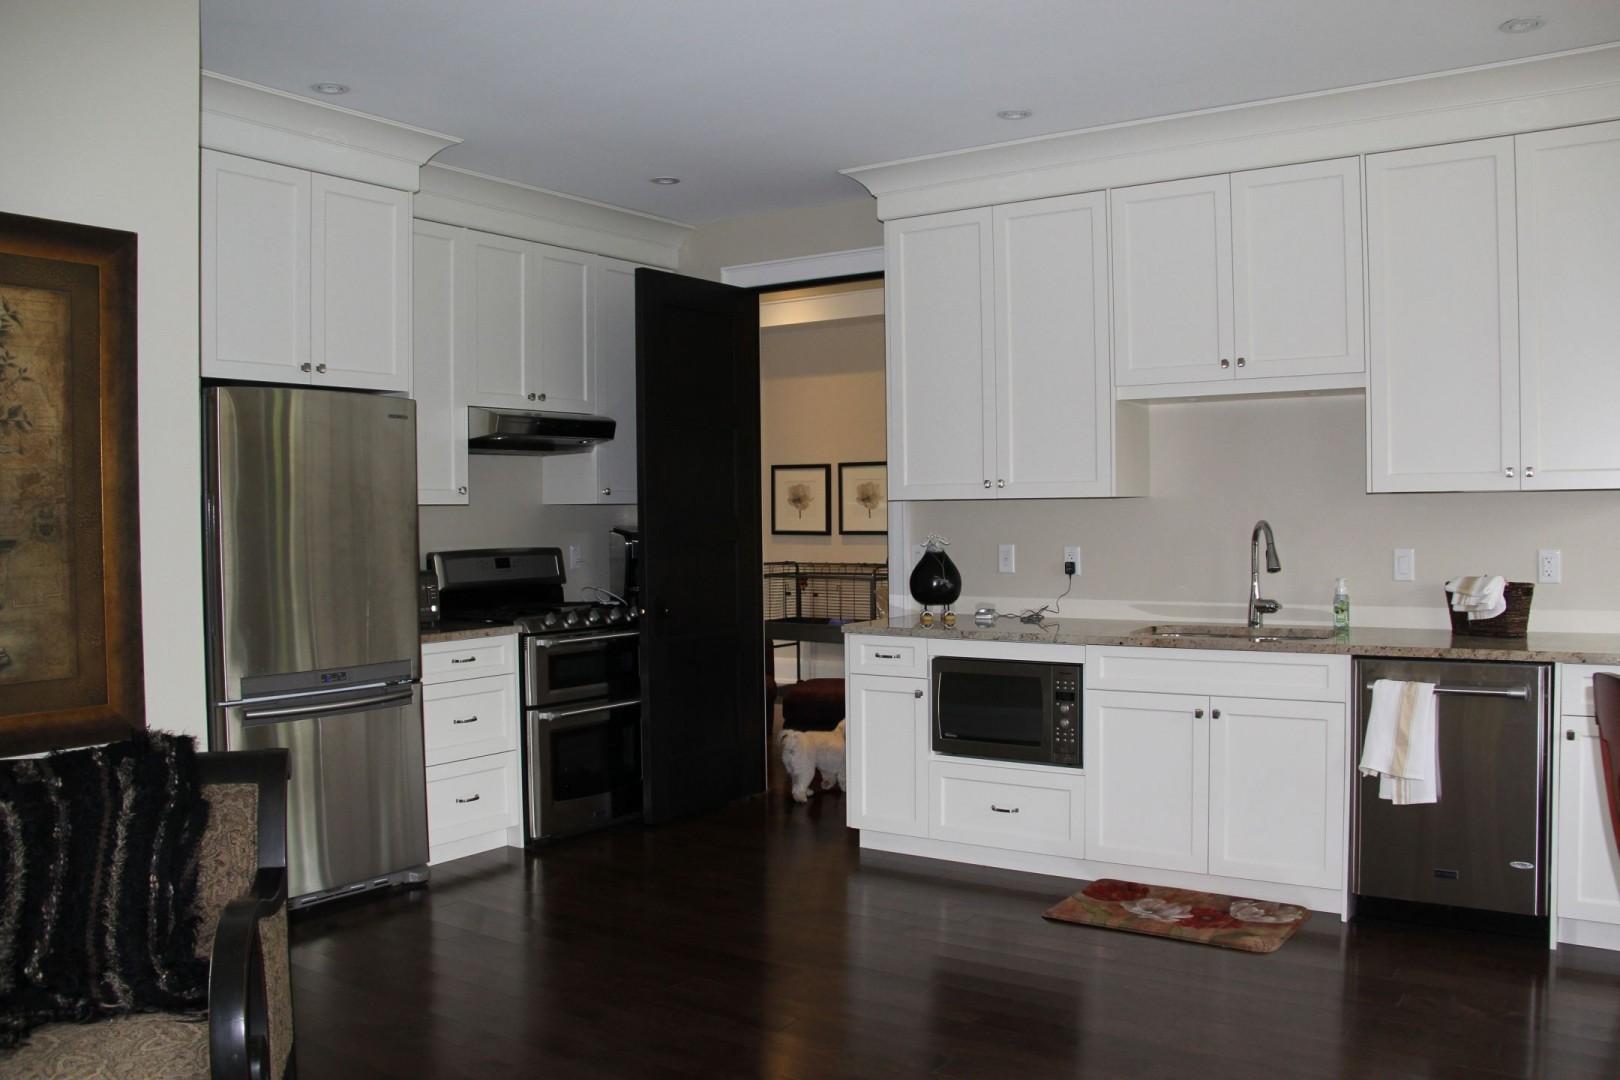 Laura Nicholson - apartment kitchen